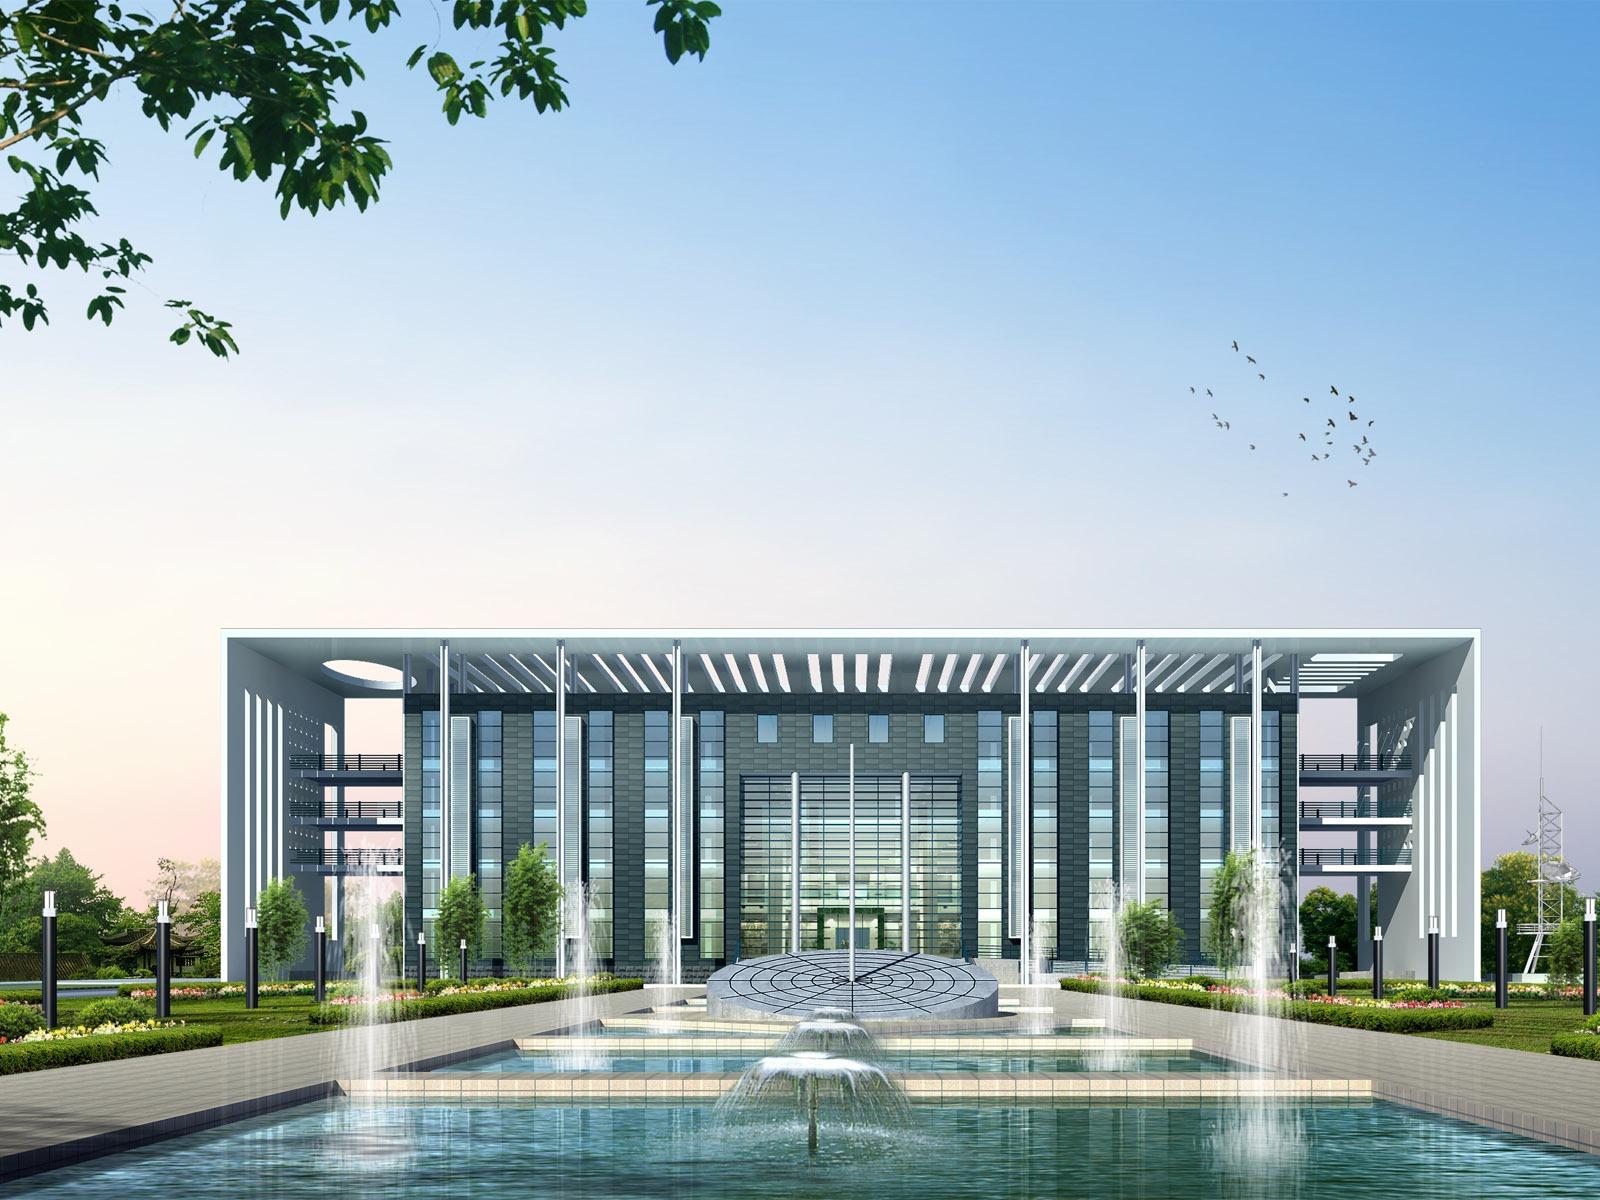 Architecture Design 3d Architectural Renderings 1600x1200